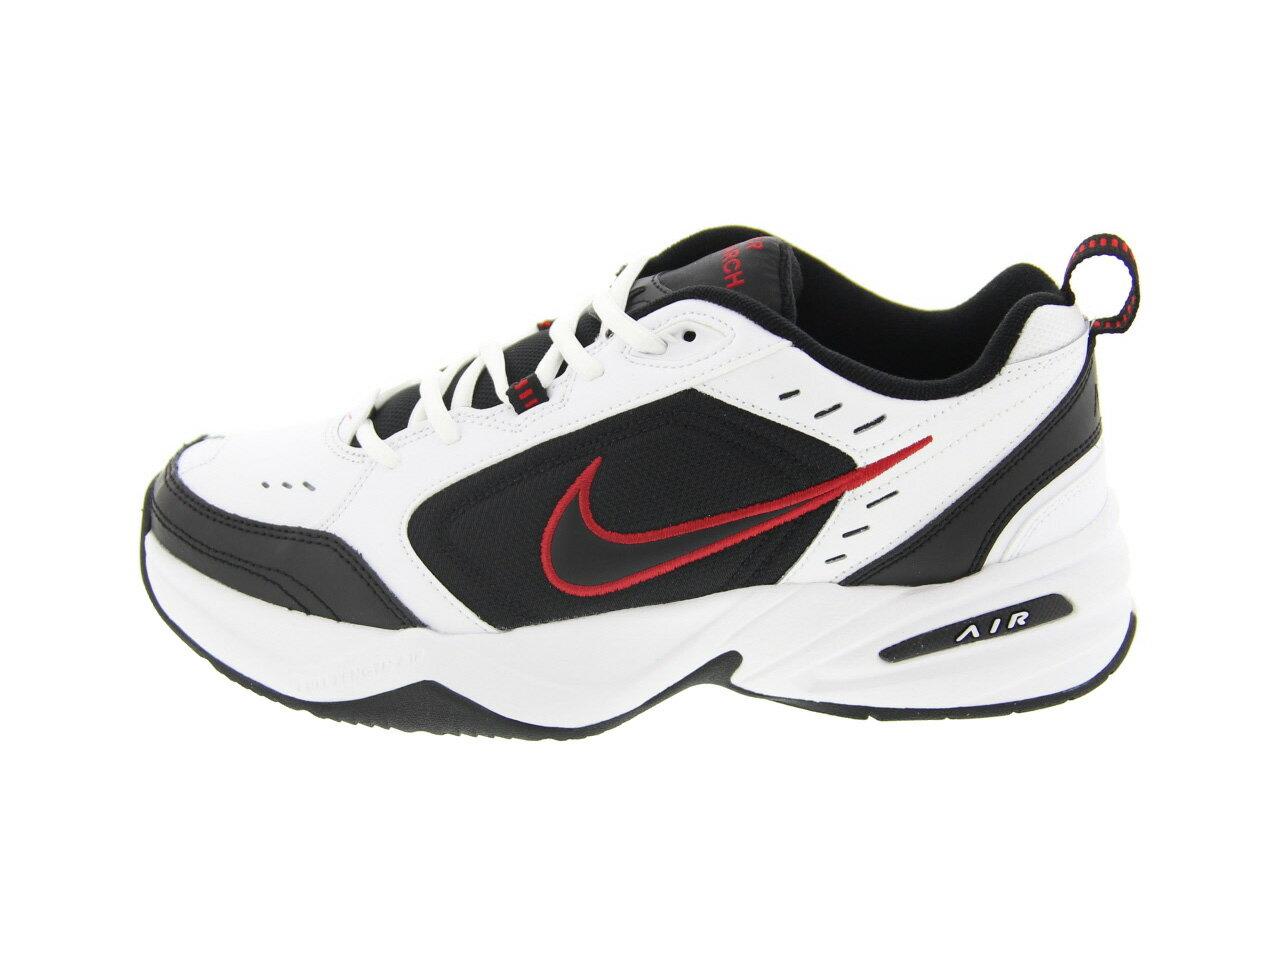 Nike Air Monarch IV(415445-101)【ナイキ エアモナーク4】【メンズファッション】【シューズ】【スニーカー】【靴】【フットウェア】